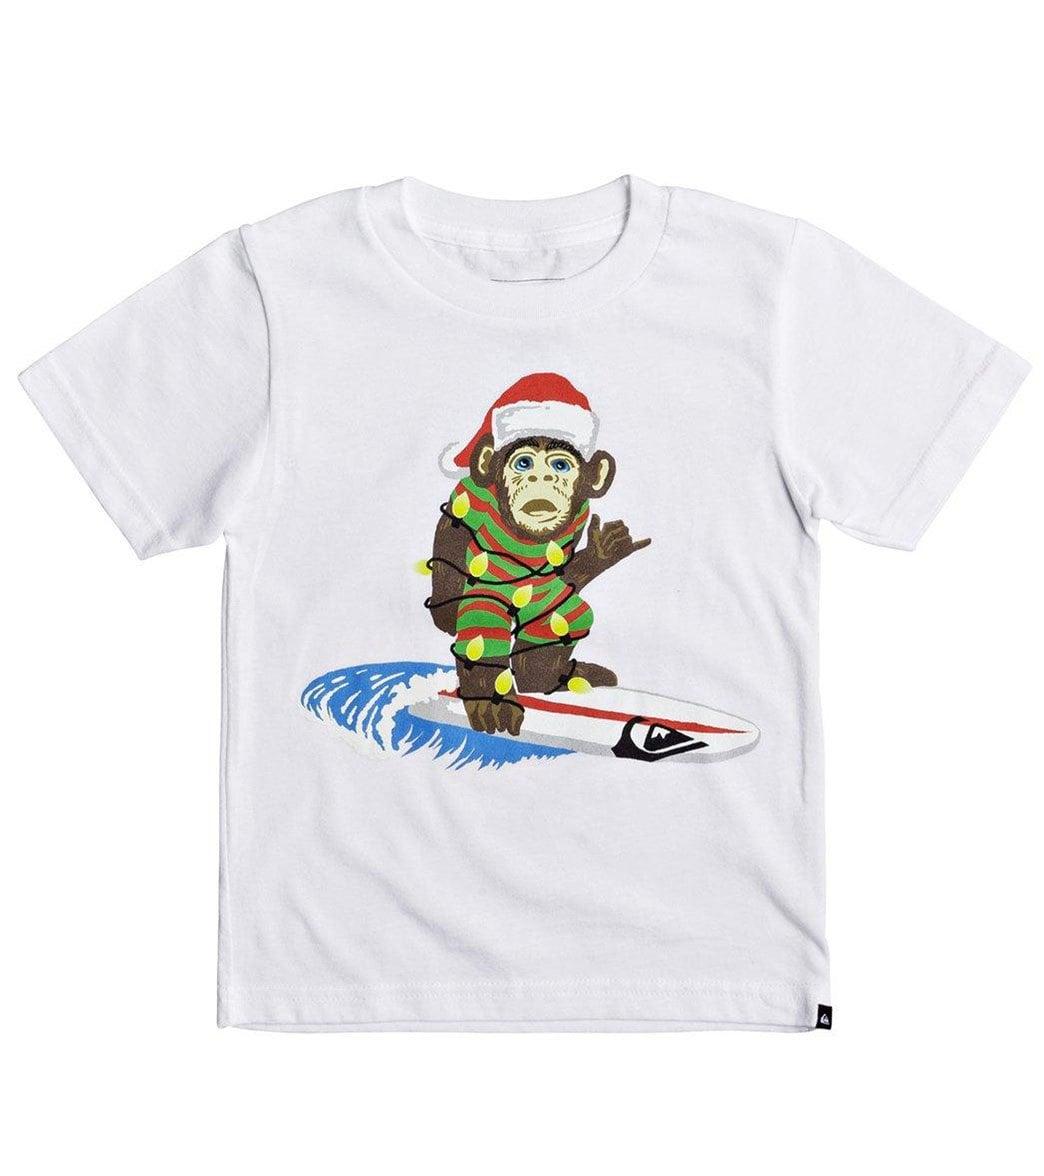 ee979ef716 Quiksilver Boys' Santa Surf Monkey Tee Shirt (Little Kid)